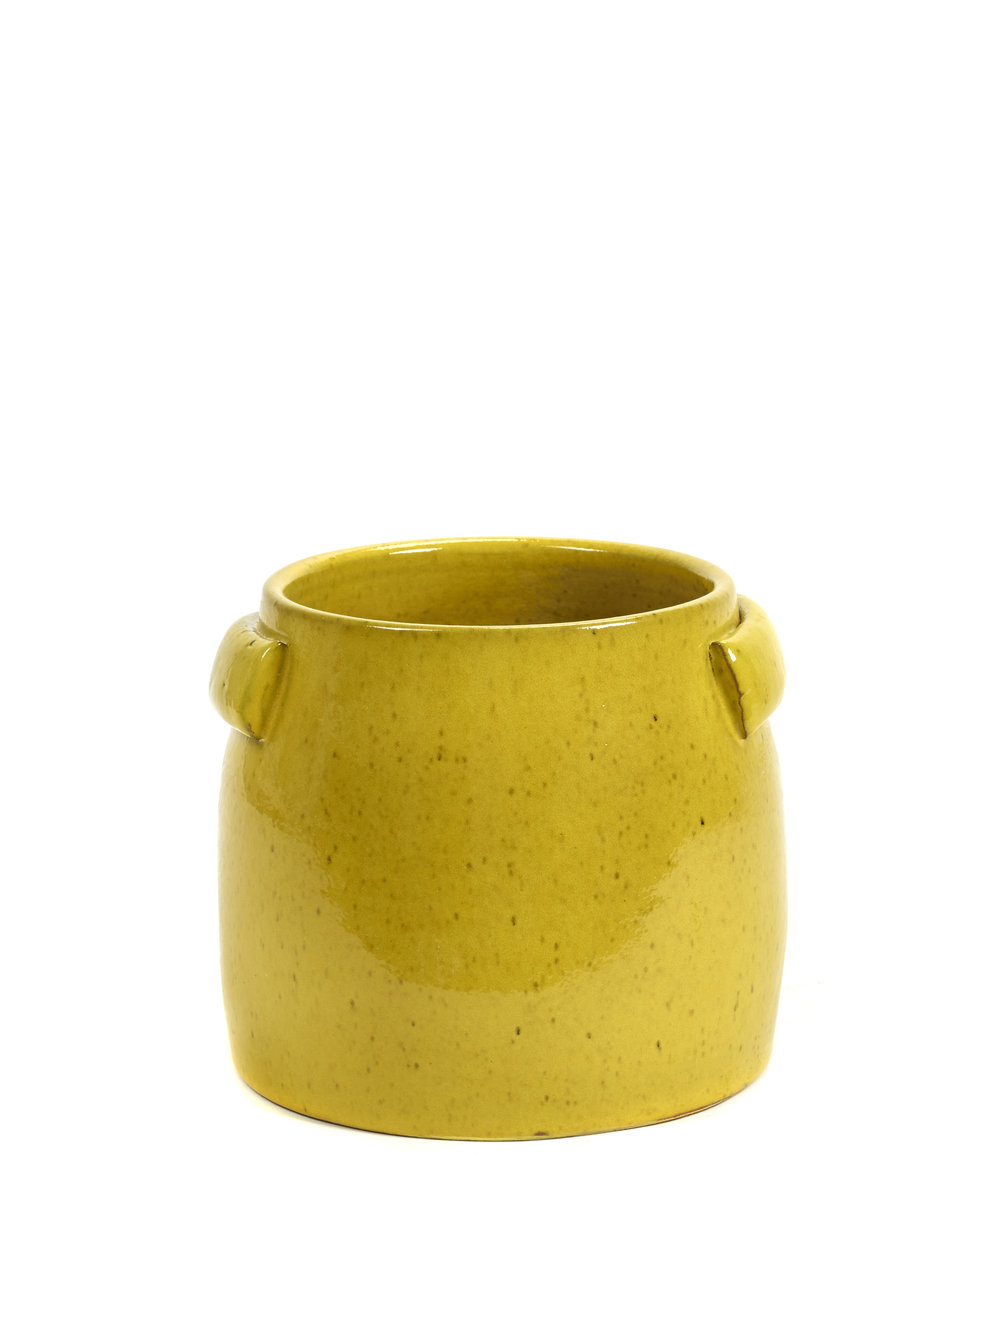 Tabor small pot £43.50